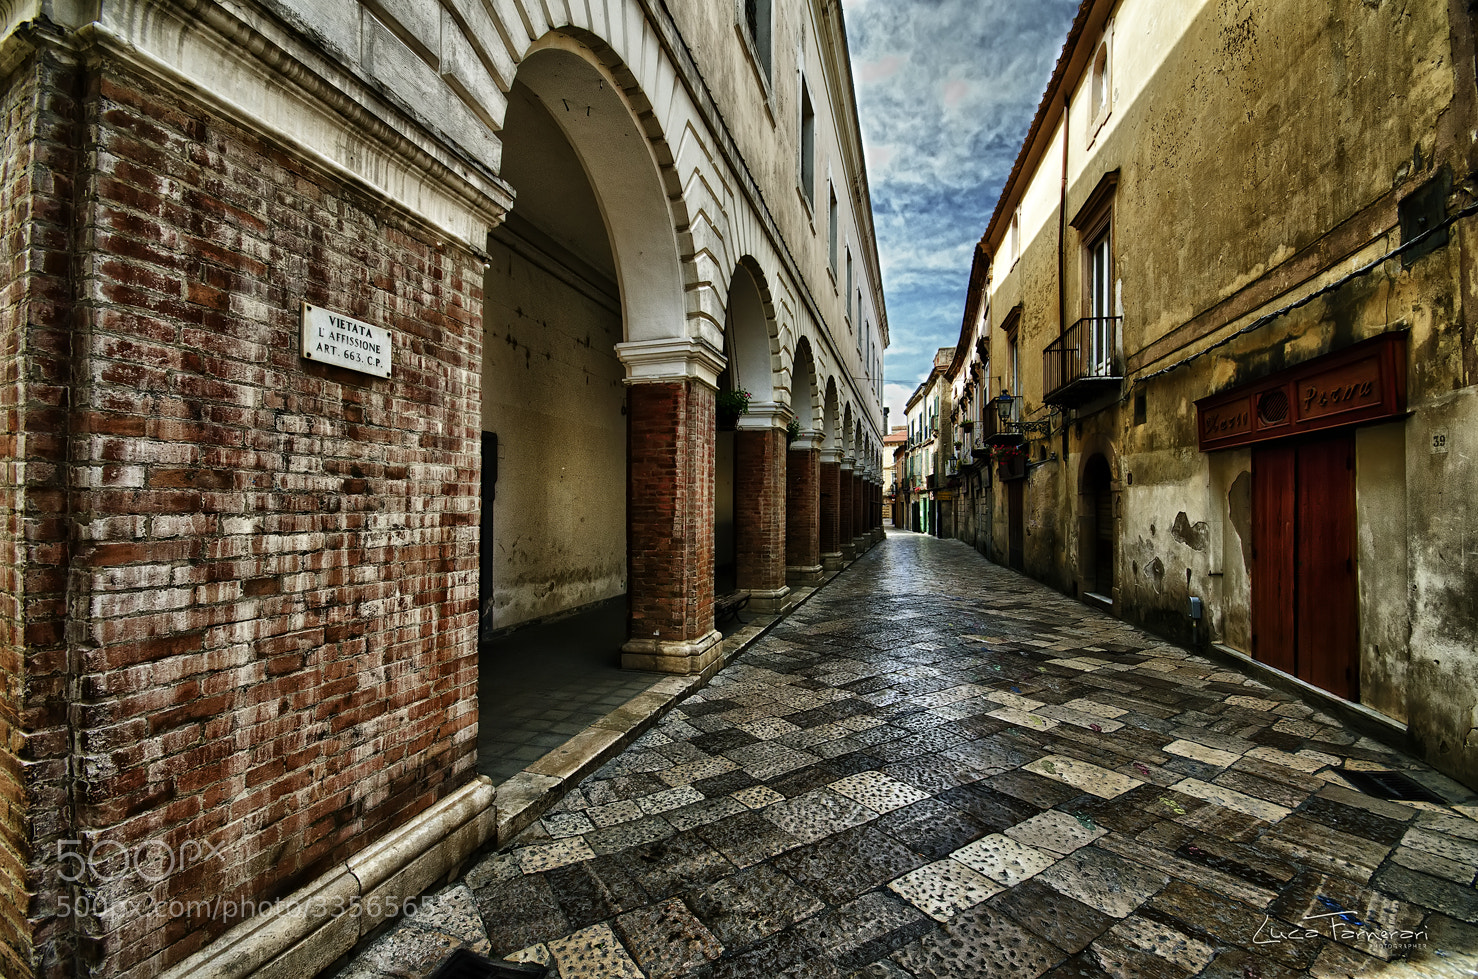 Photograph Sant'Agata De' Goti by Luca Farnerari on 500px